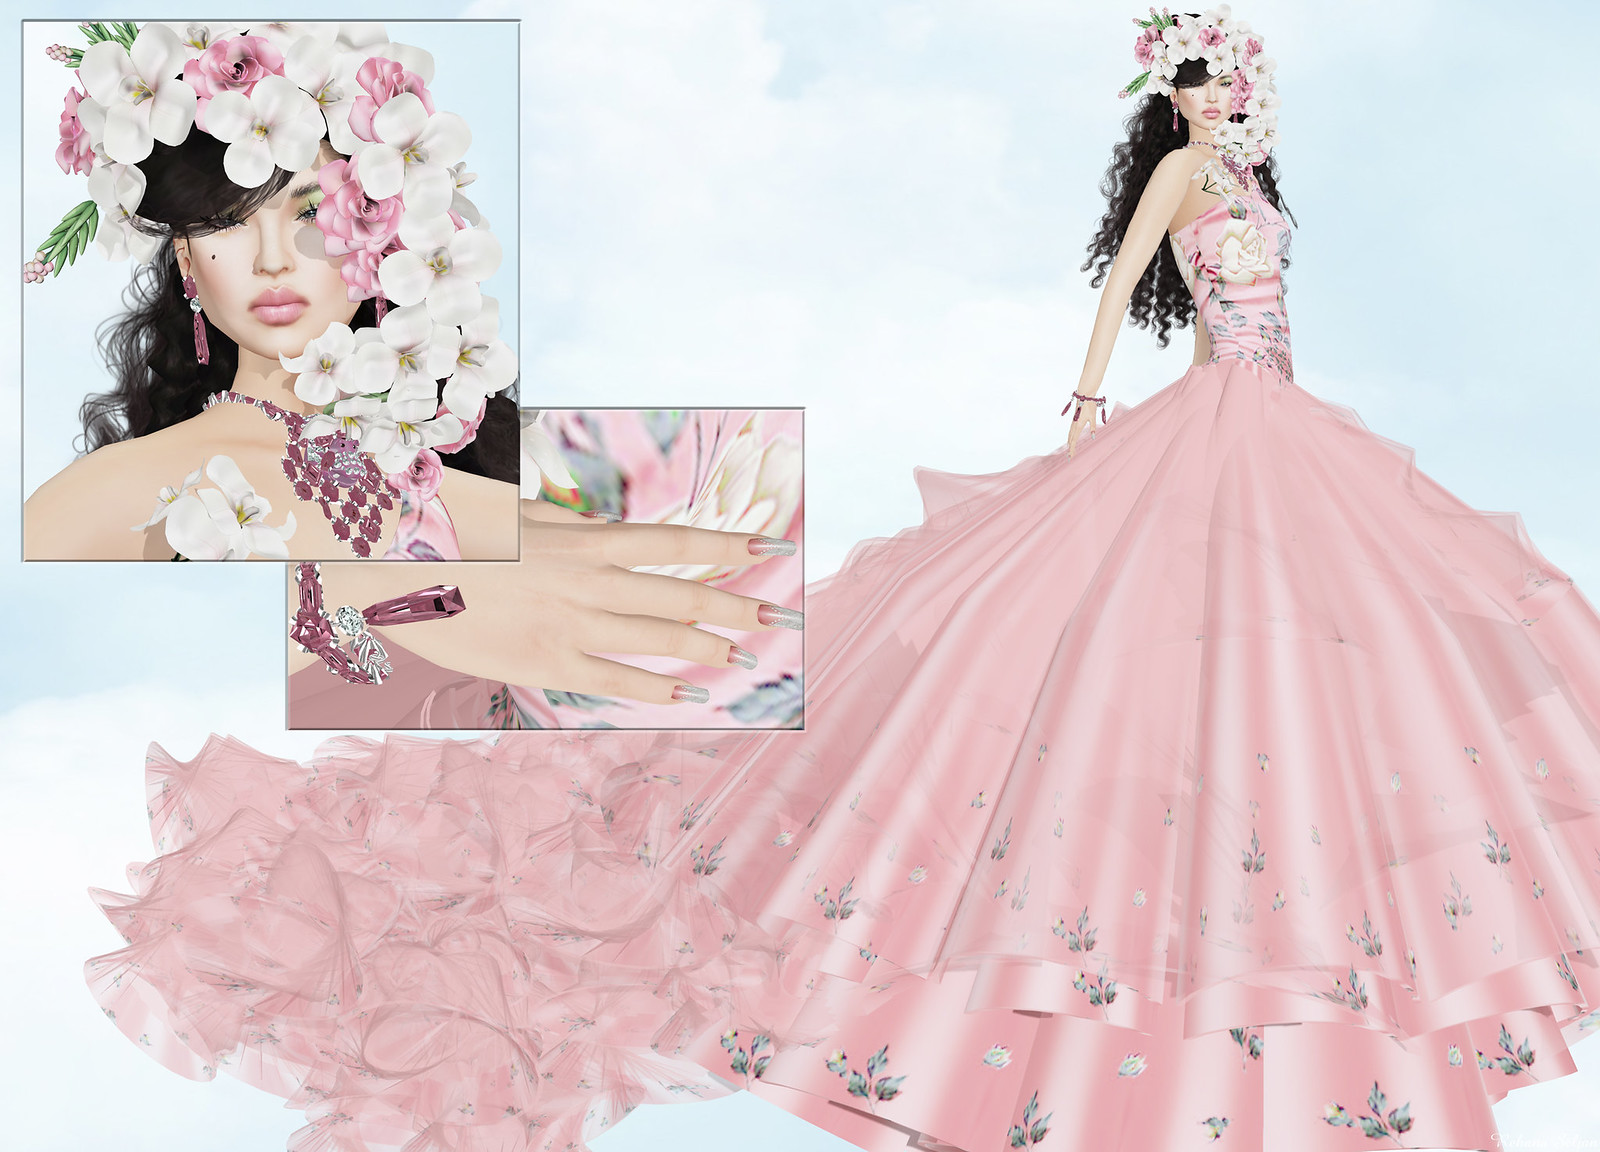 Sascha's Designs - Floretta